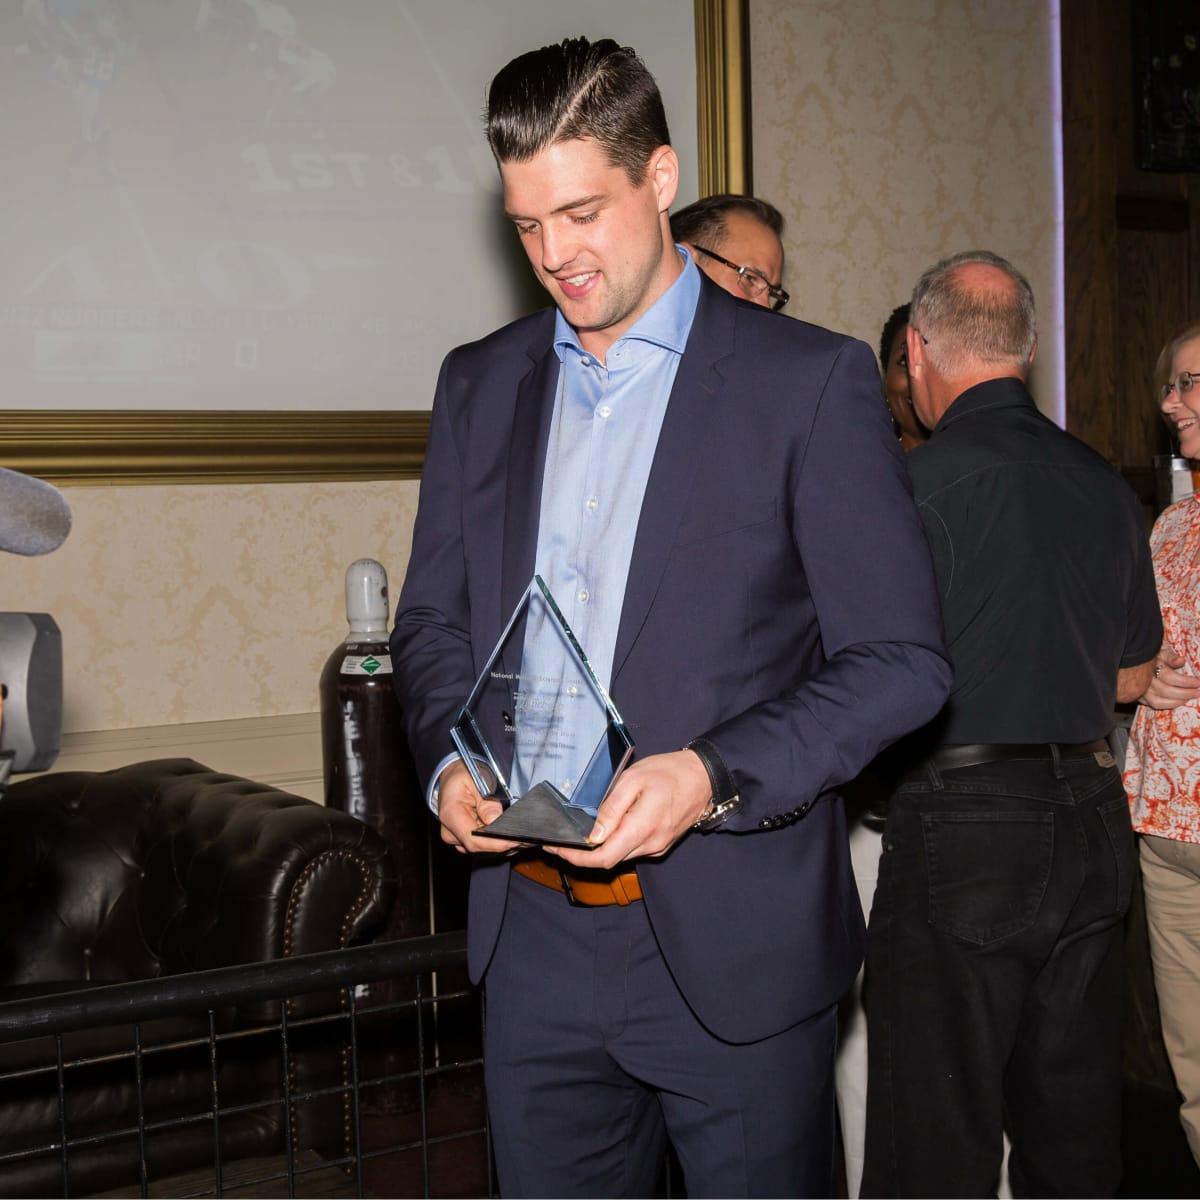 Jamie Benn with his NMSS award